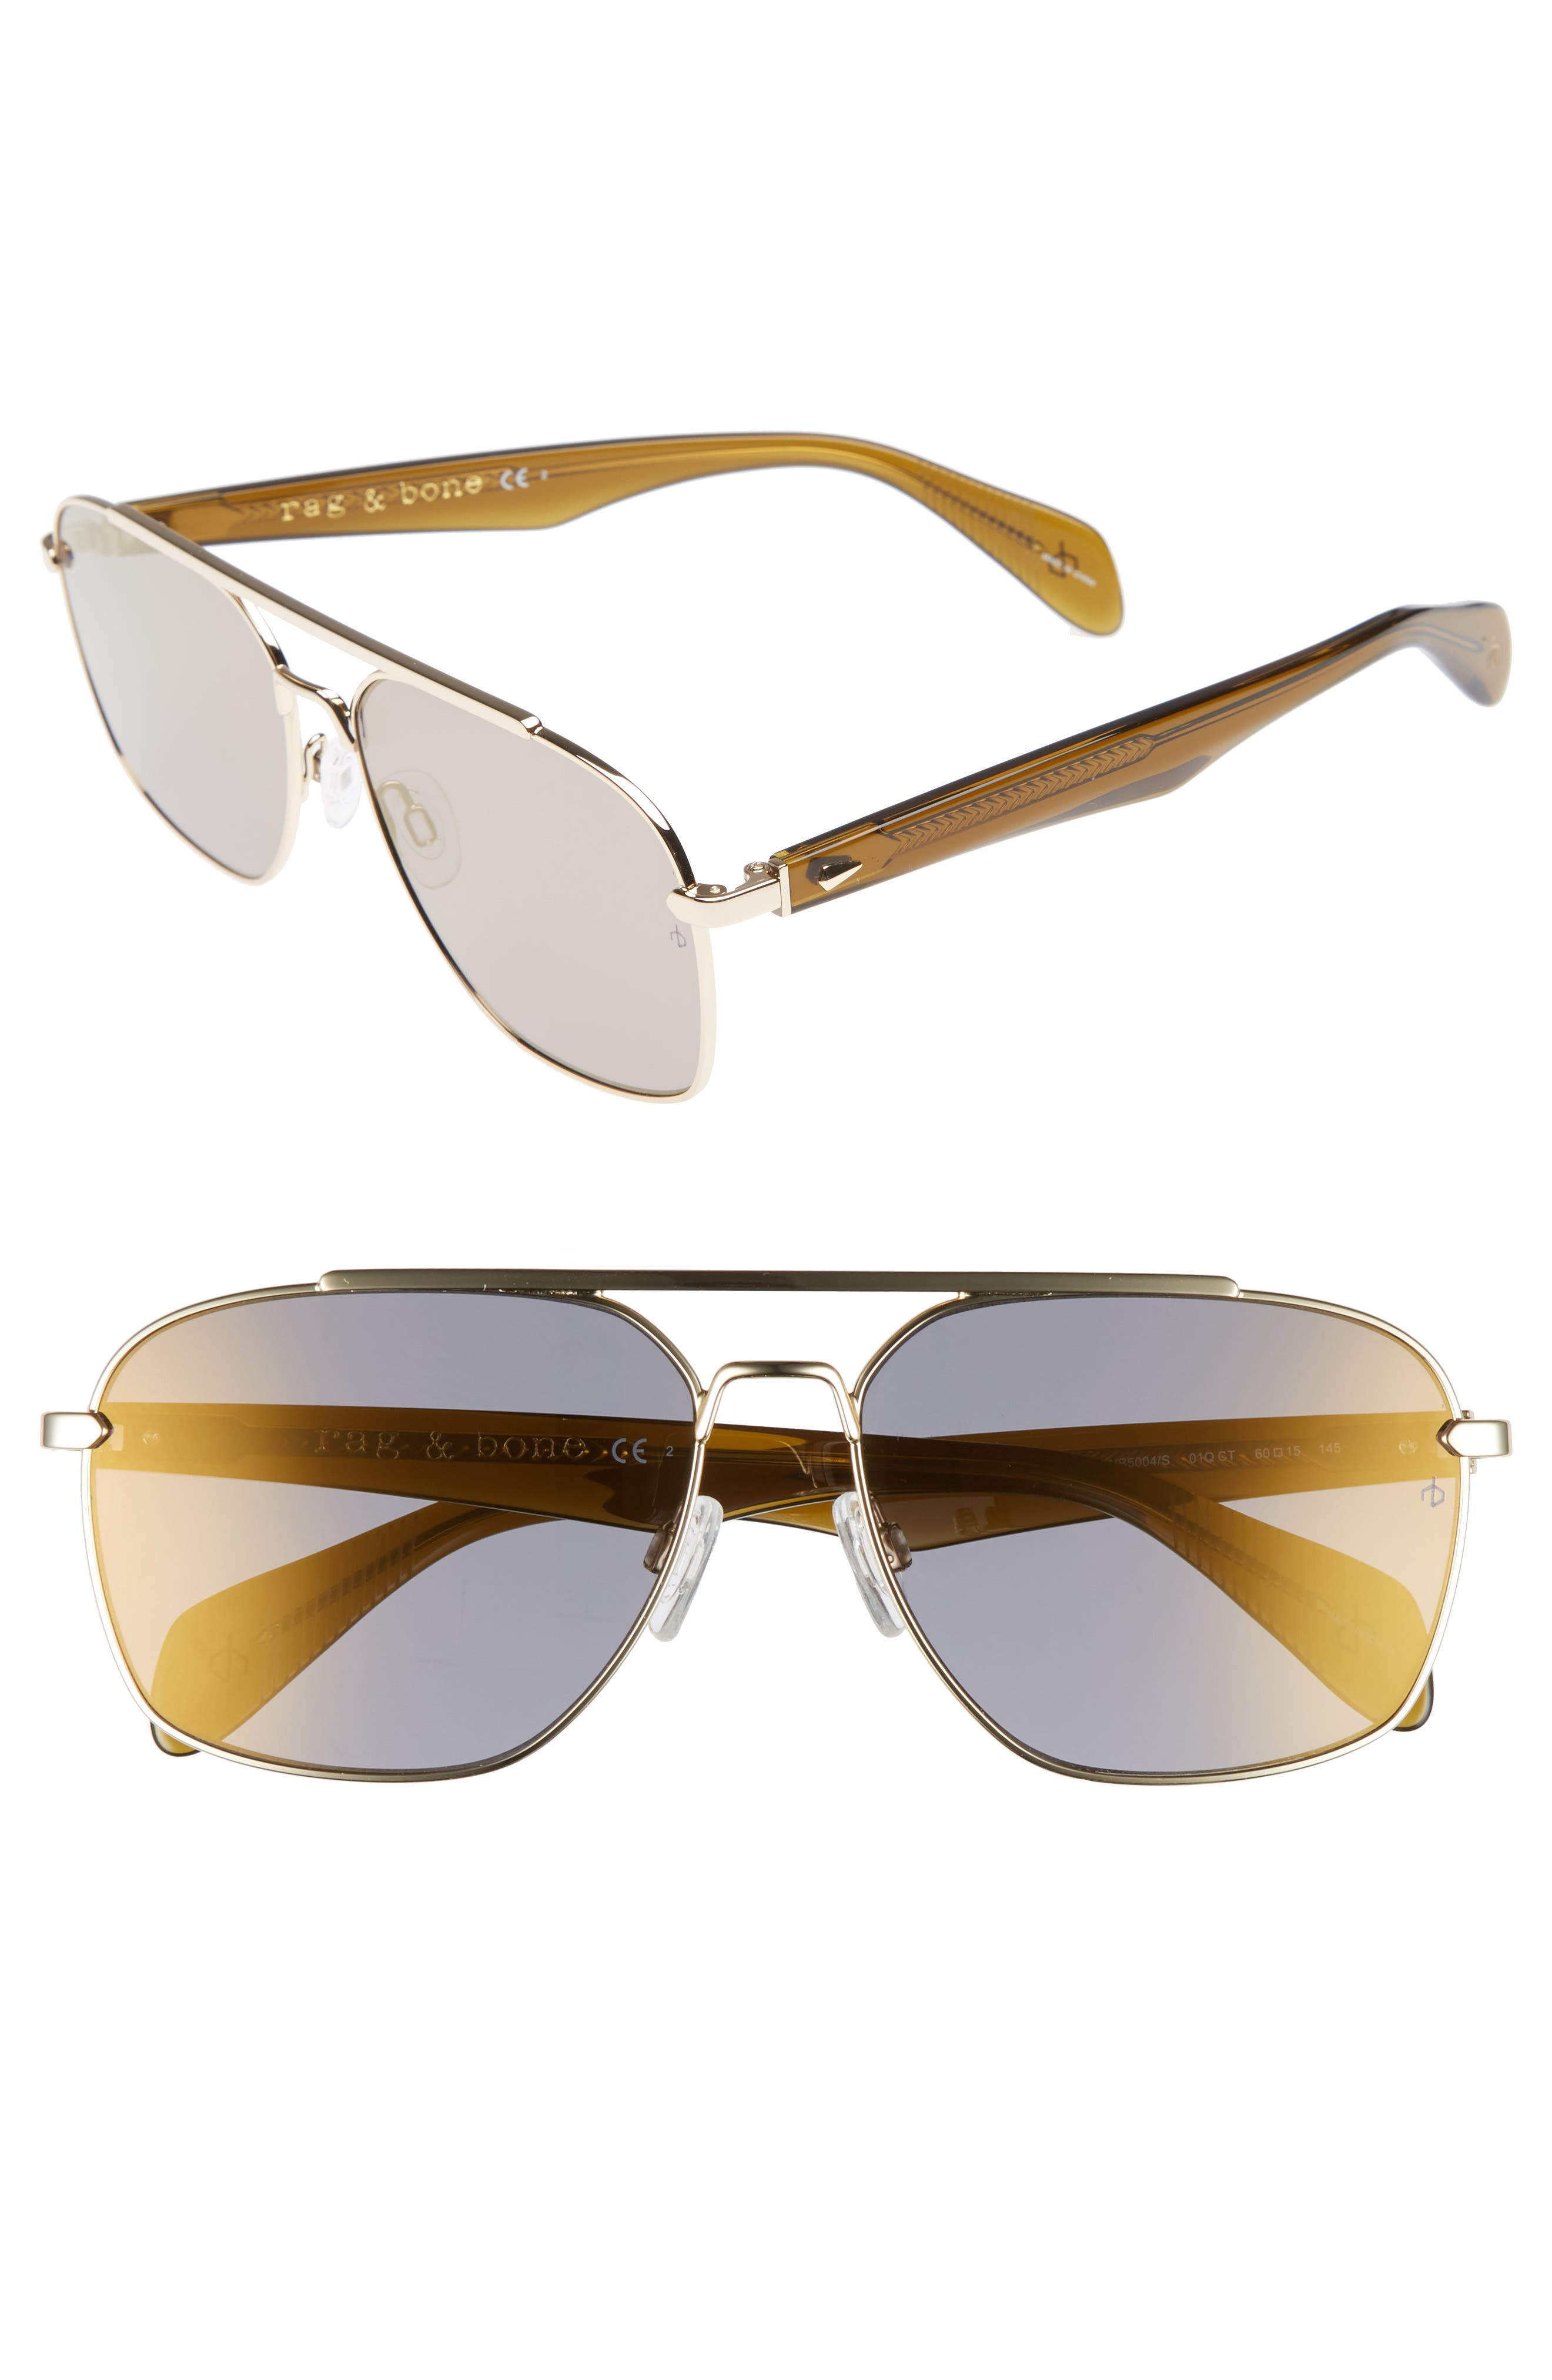 60mm Navigator Sunglasses,                             Main thumbnail 1, color,                             710